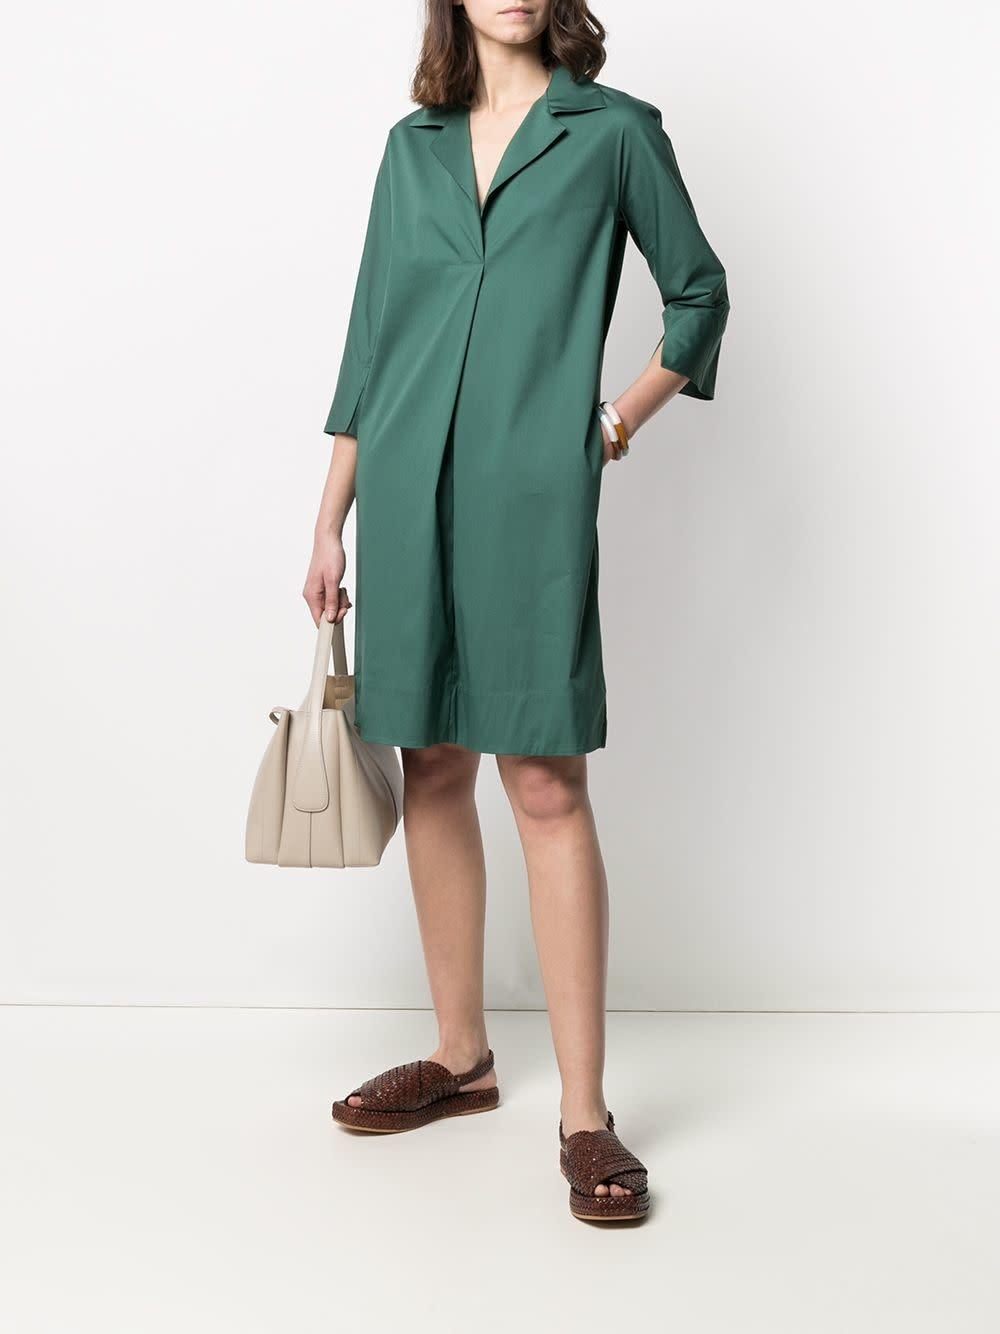 Melania dress antonelli-2